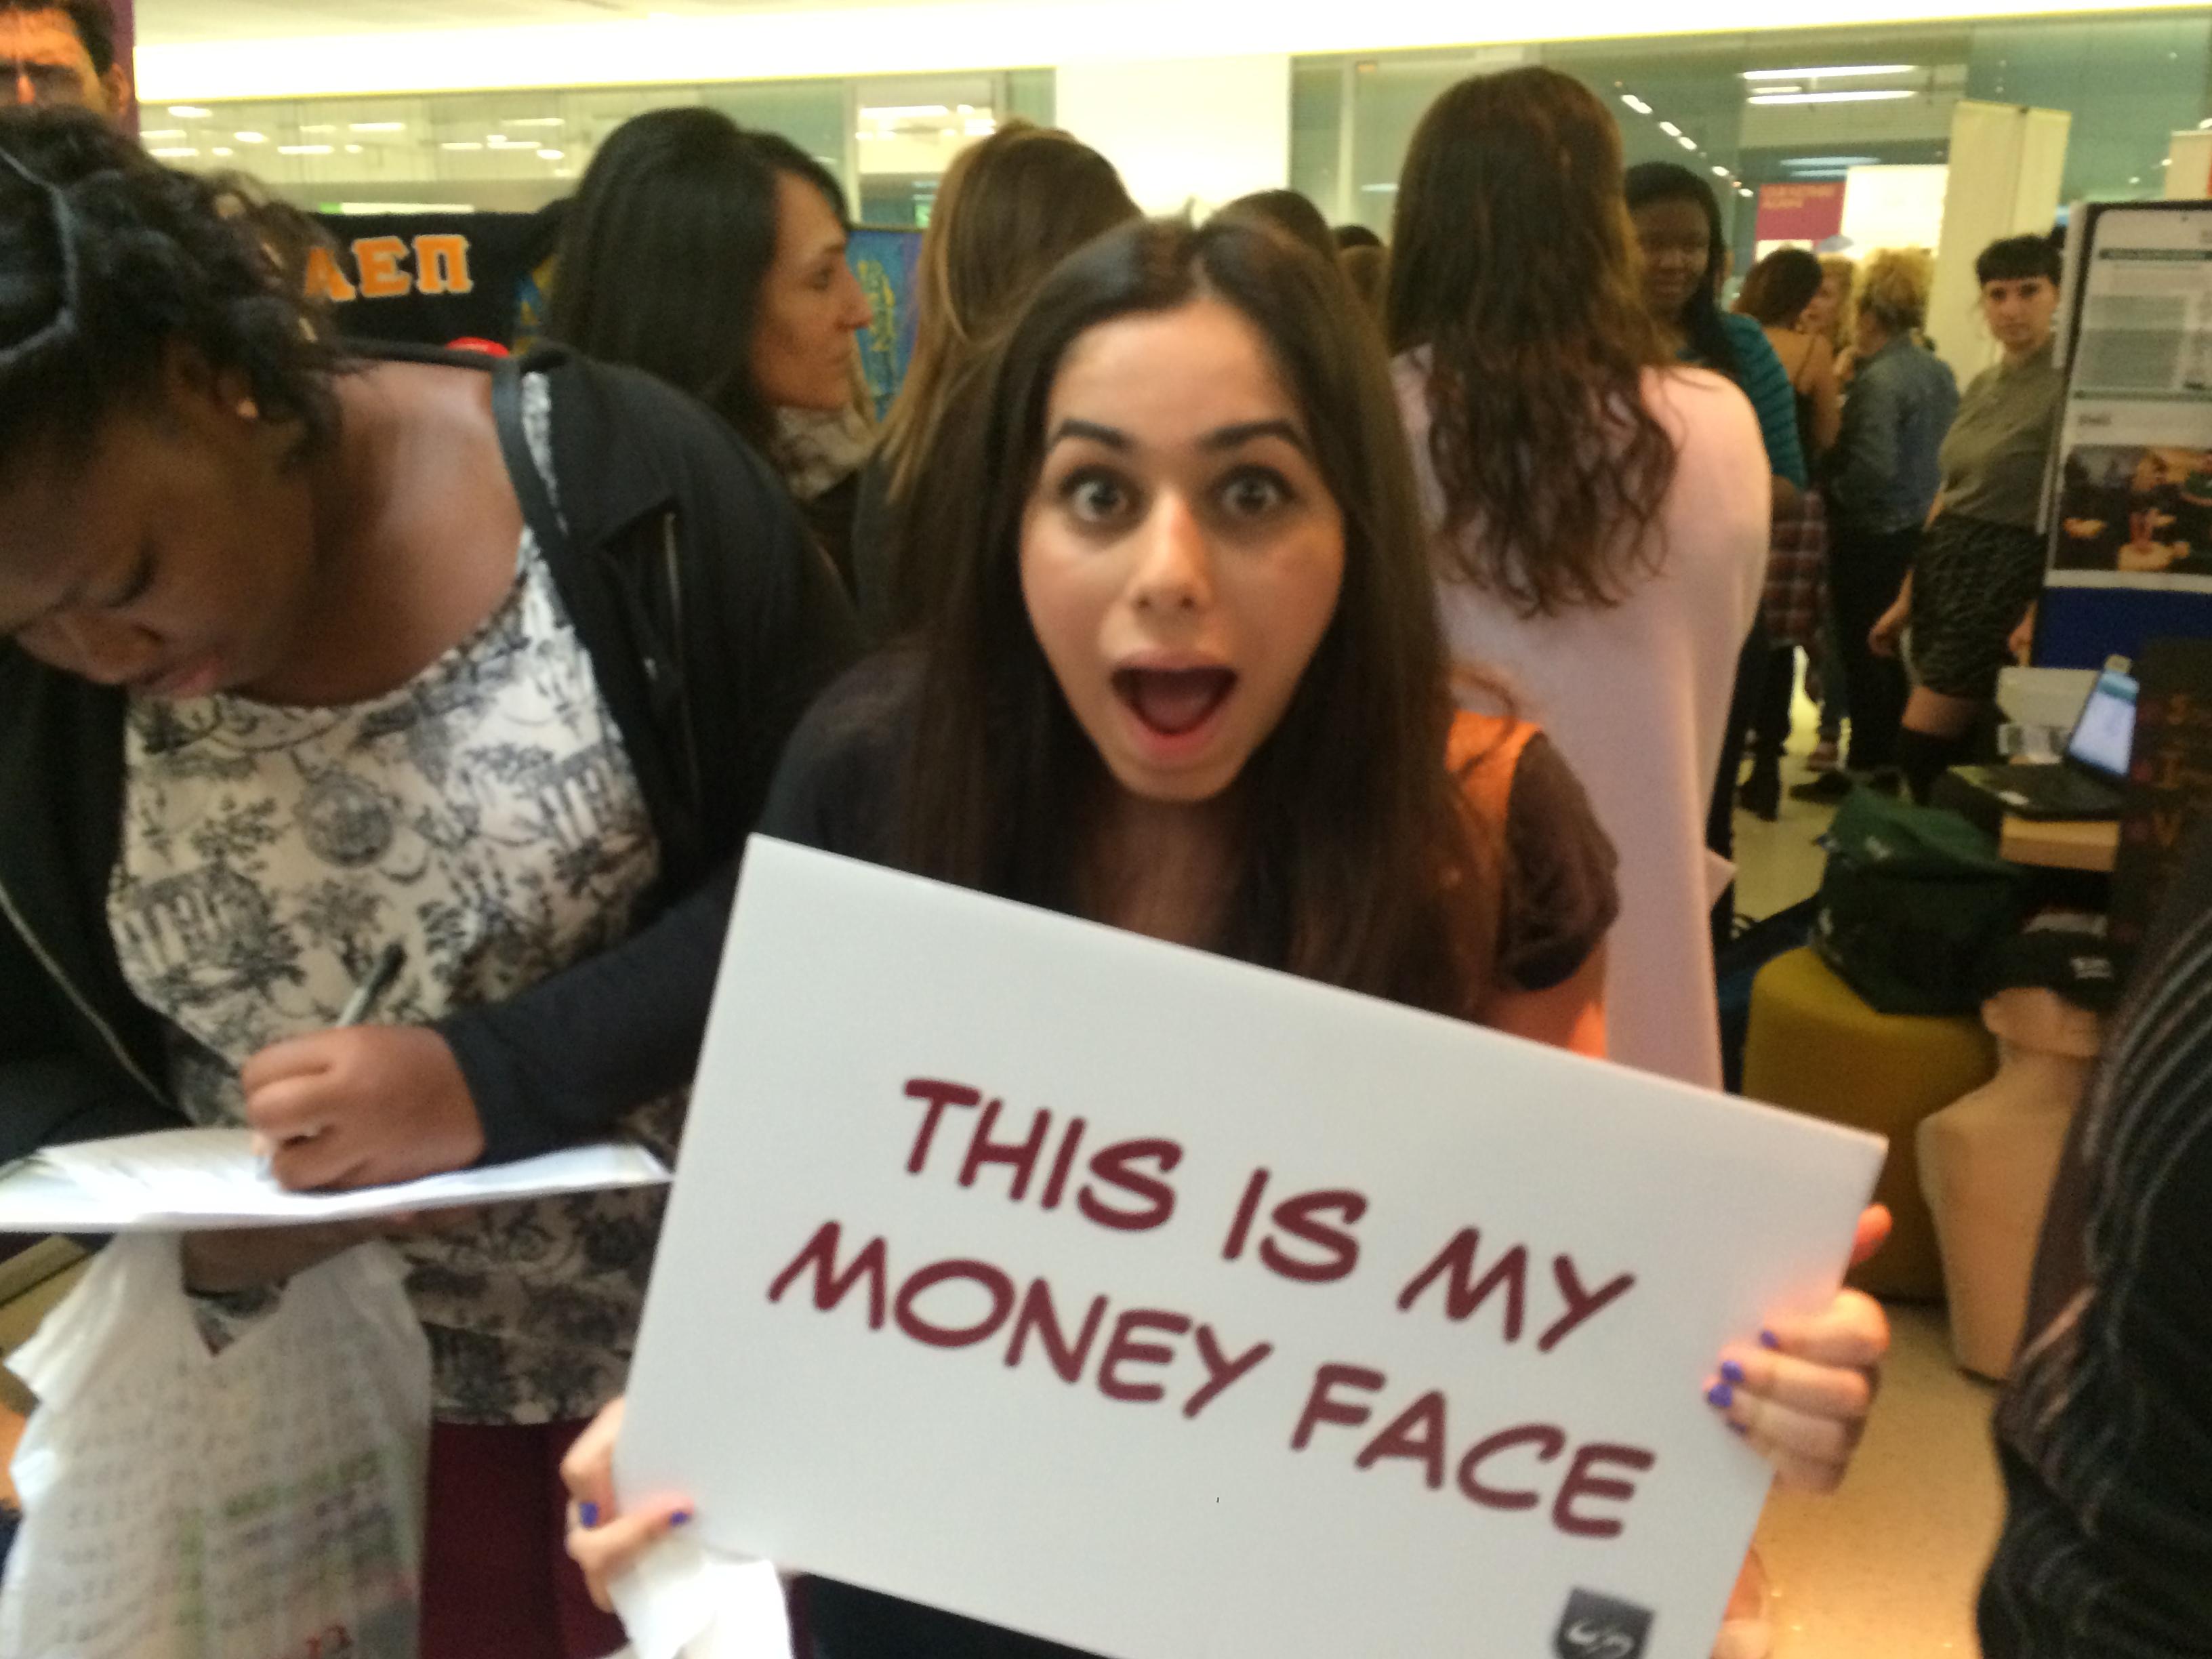 University of Westminster Money Face